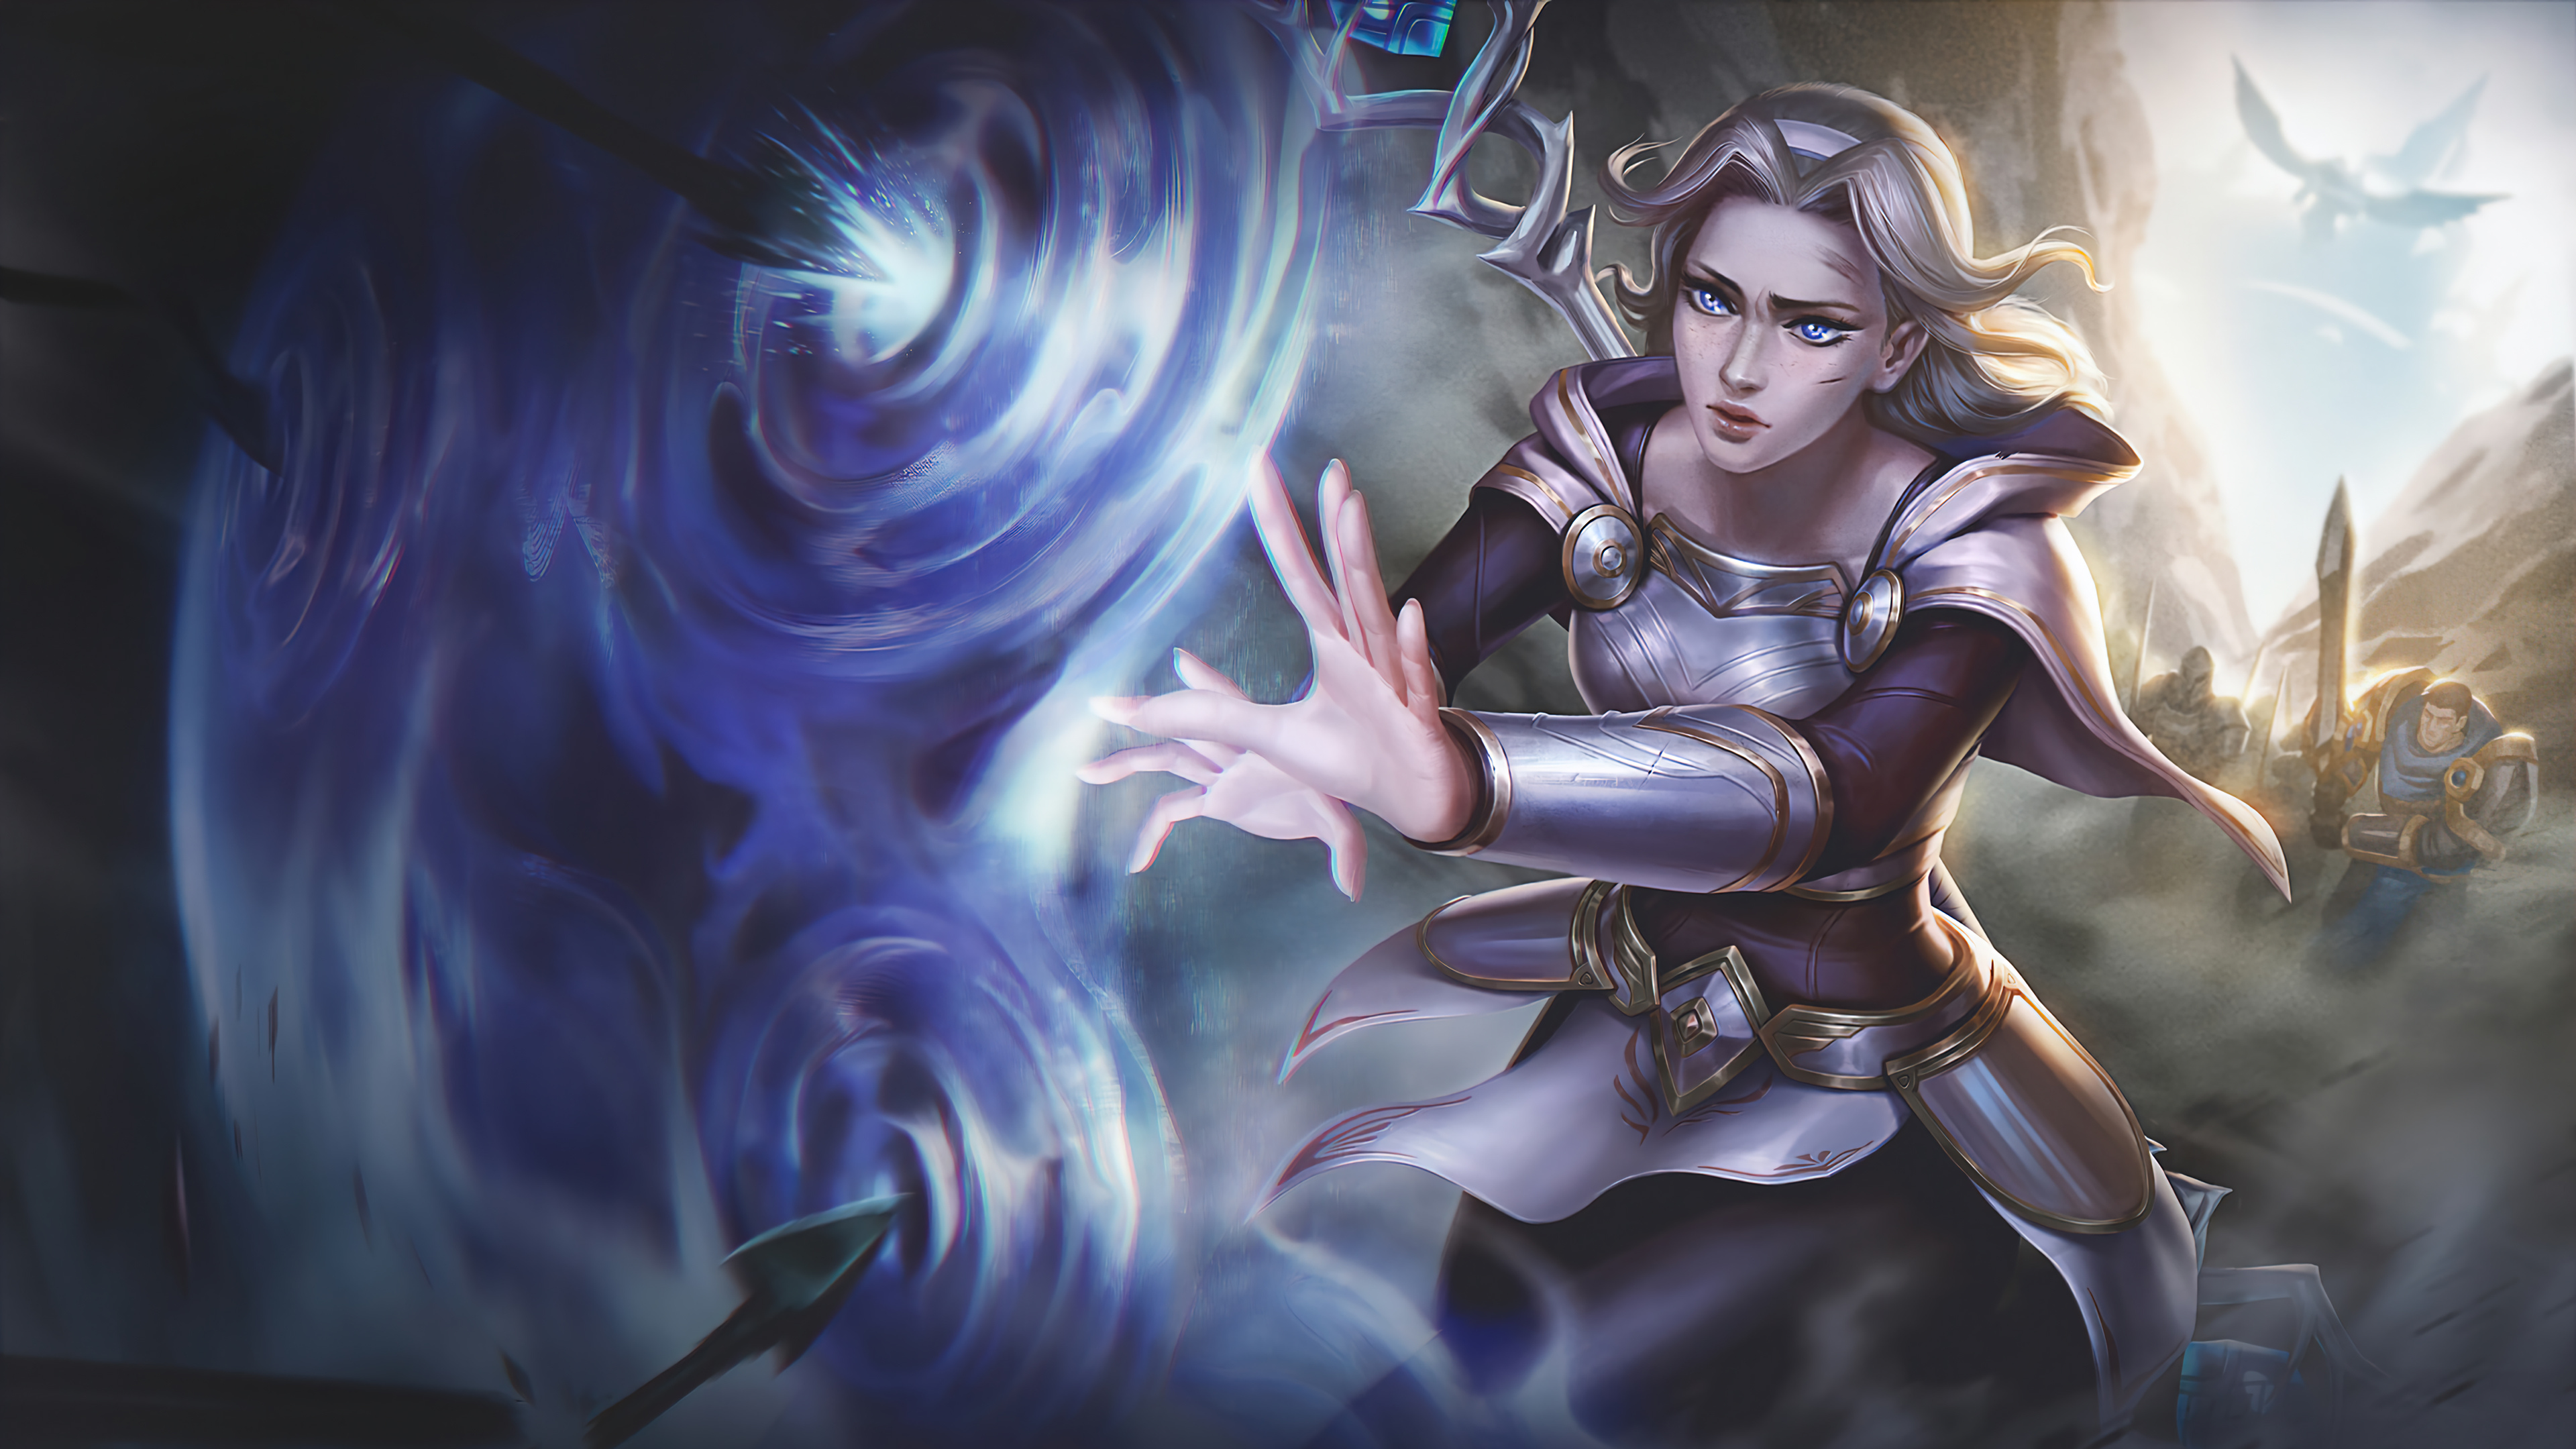 Wallpaper Lux League of Legends Art